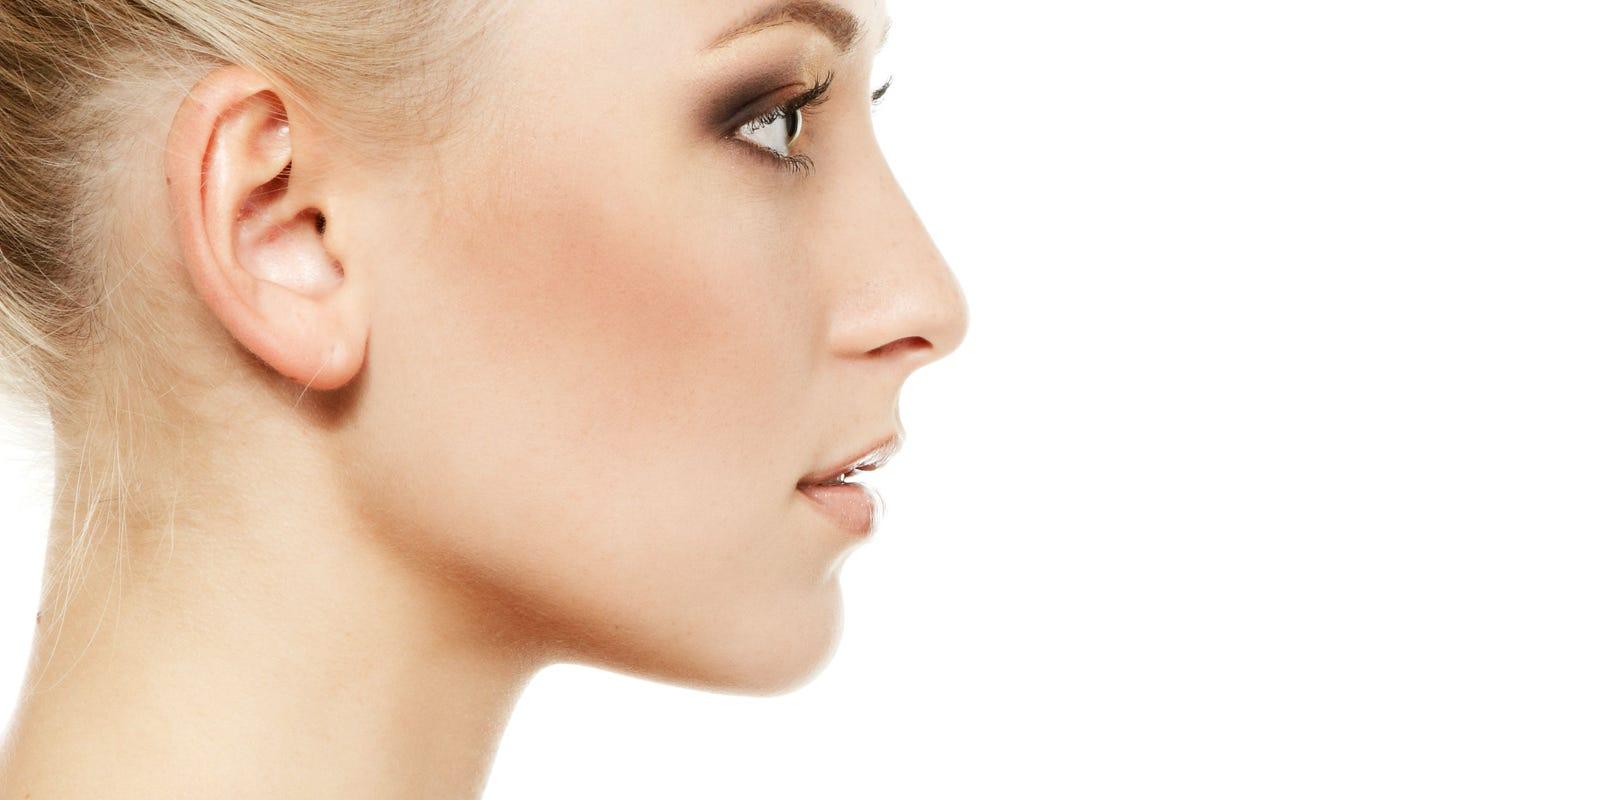 Turbinate Reduction Nasal (Turbinectomy) Surgery In Iran